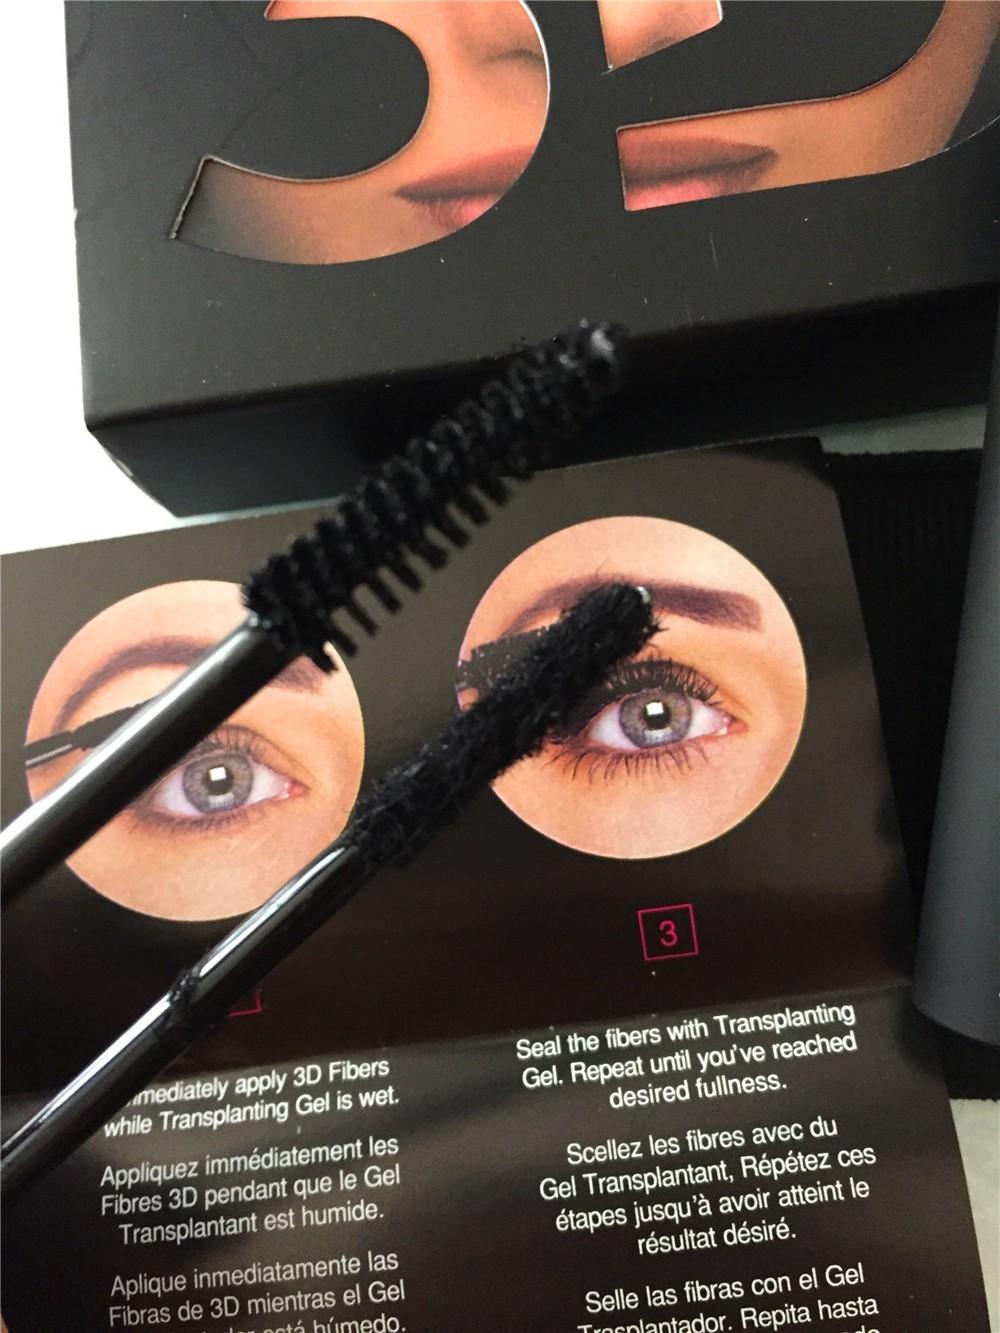 New Arrive Unique MOODSTRUCK 3D FIBER LASHES+ MASCARA LONG LASHES Set Makeup lash eyelash 1set=2pcs waterproof double mascara<br><br>Aliexpress